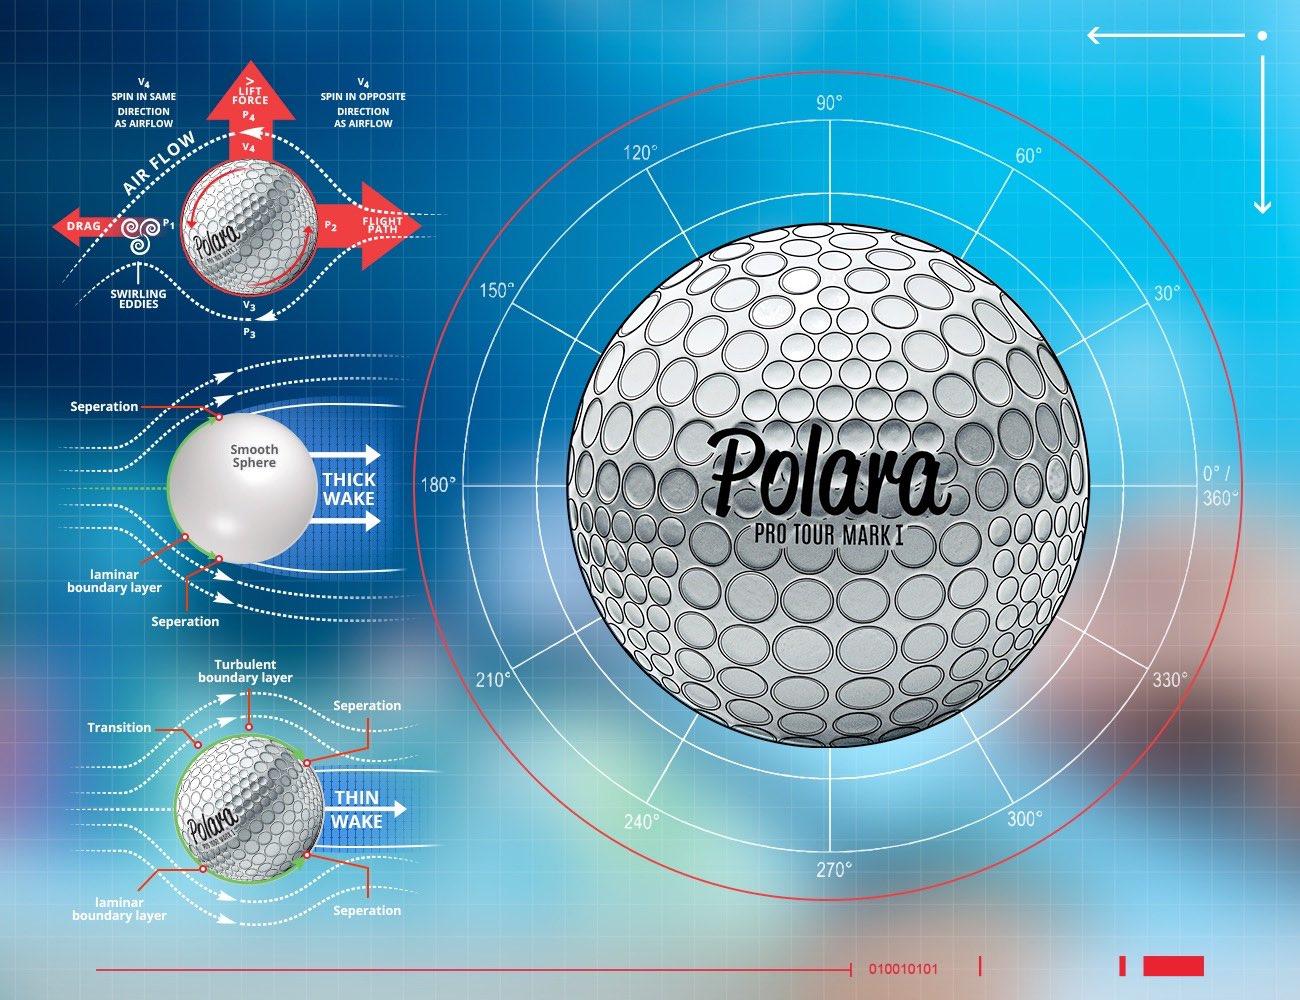 Polara Pro Tour FS Mark I – The Biggest Golf Ball Innovation In Decades!